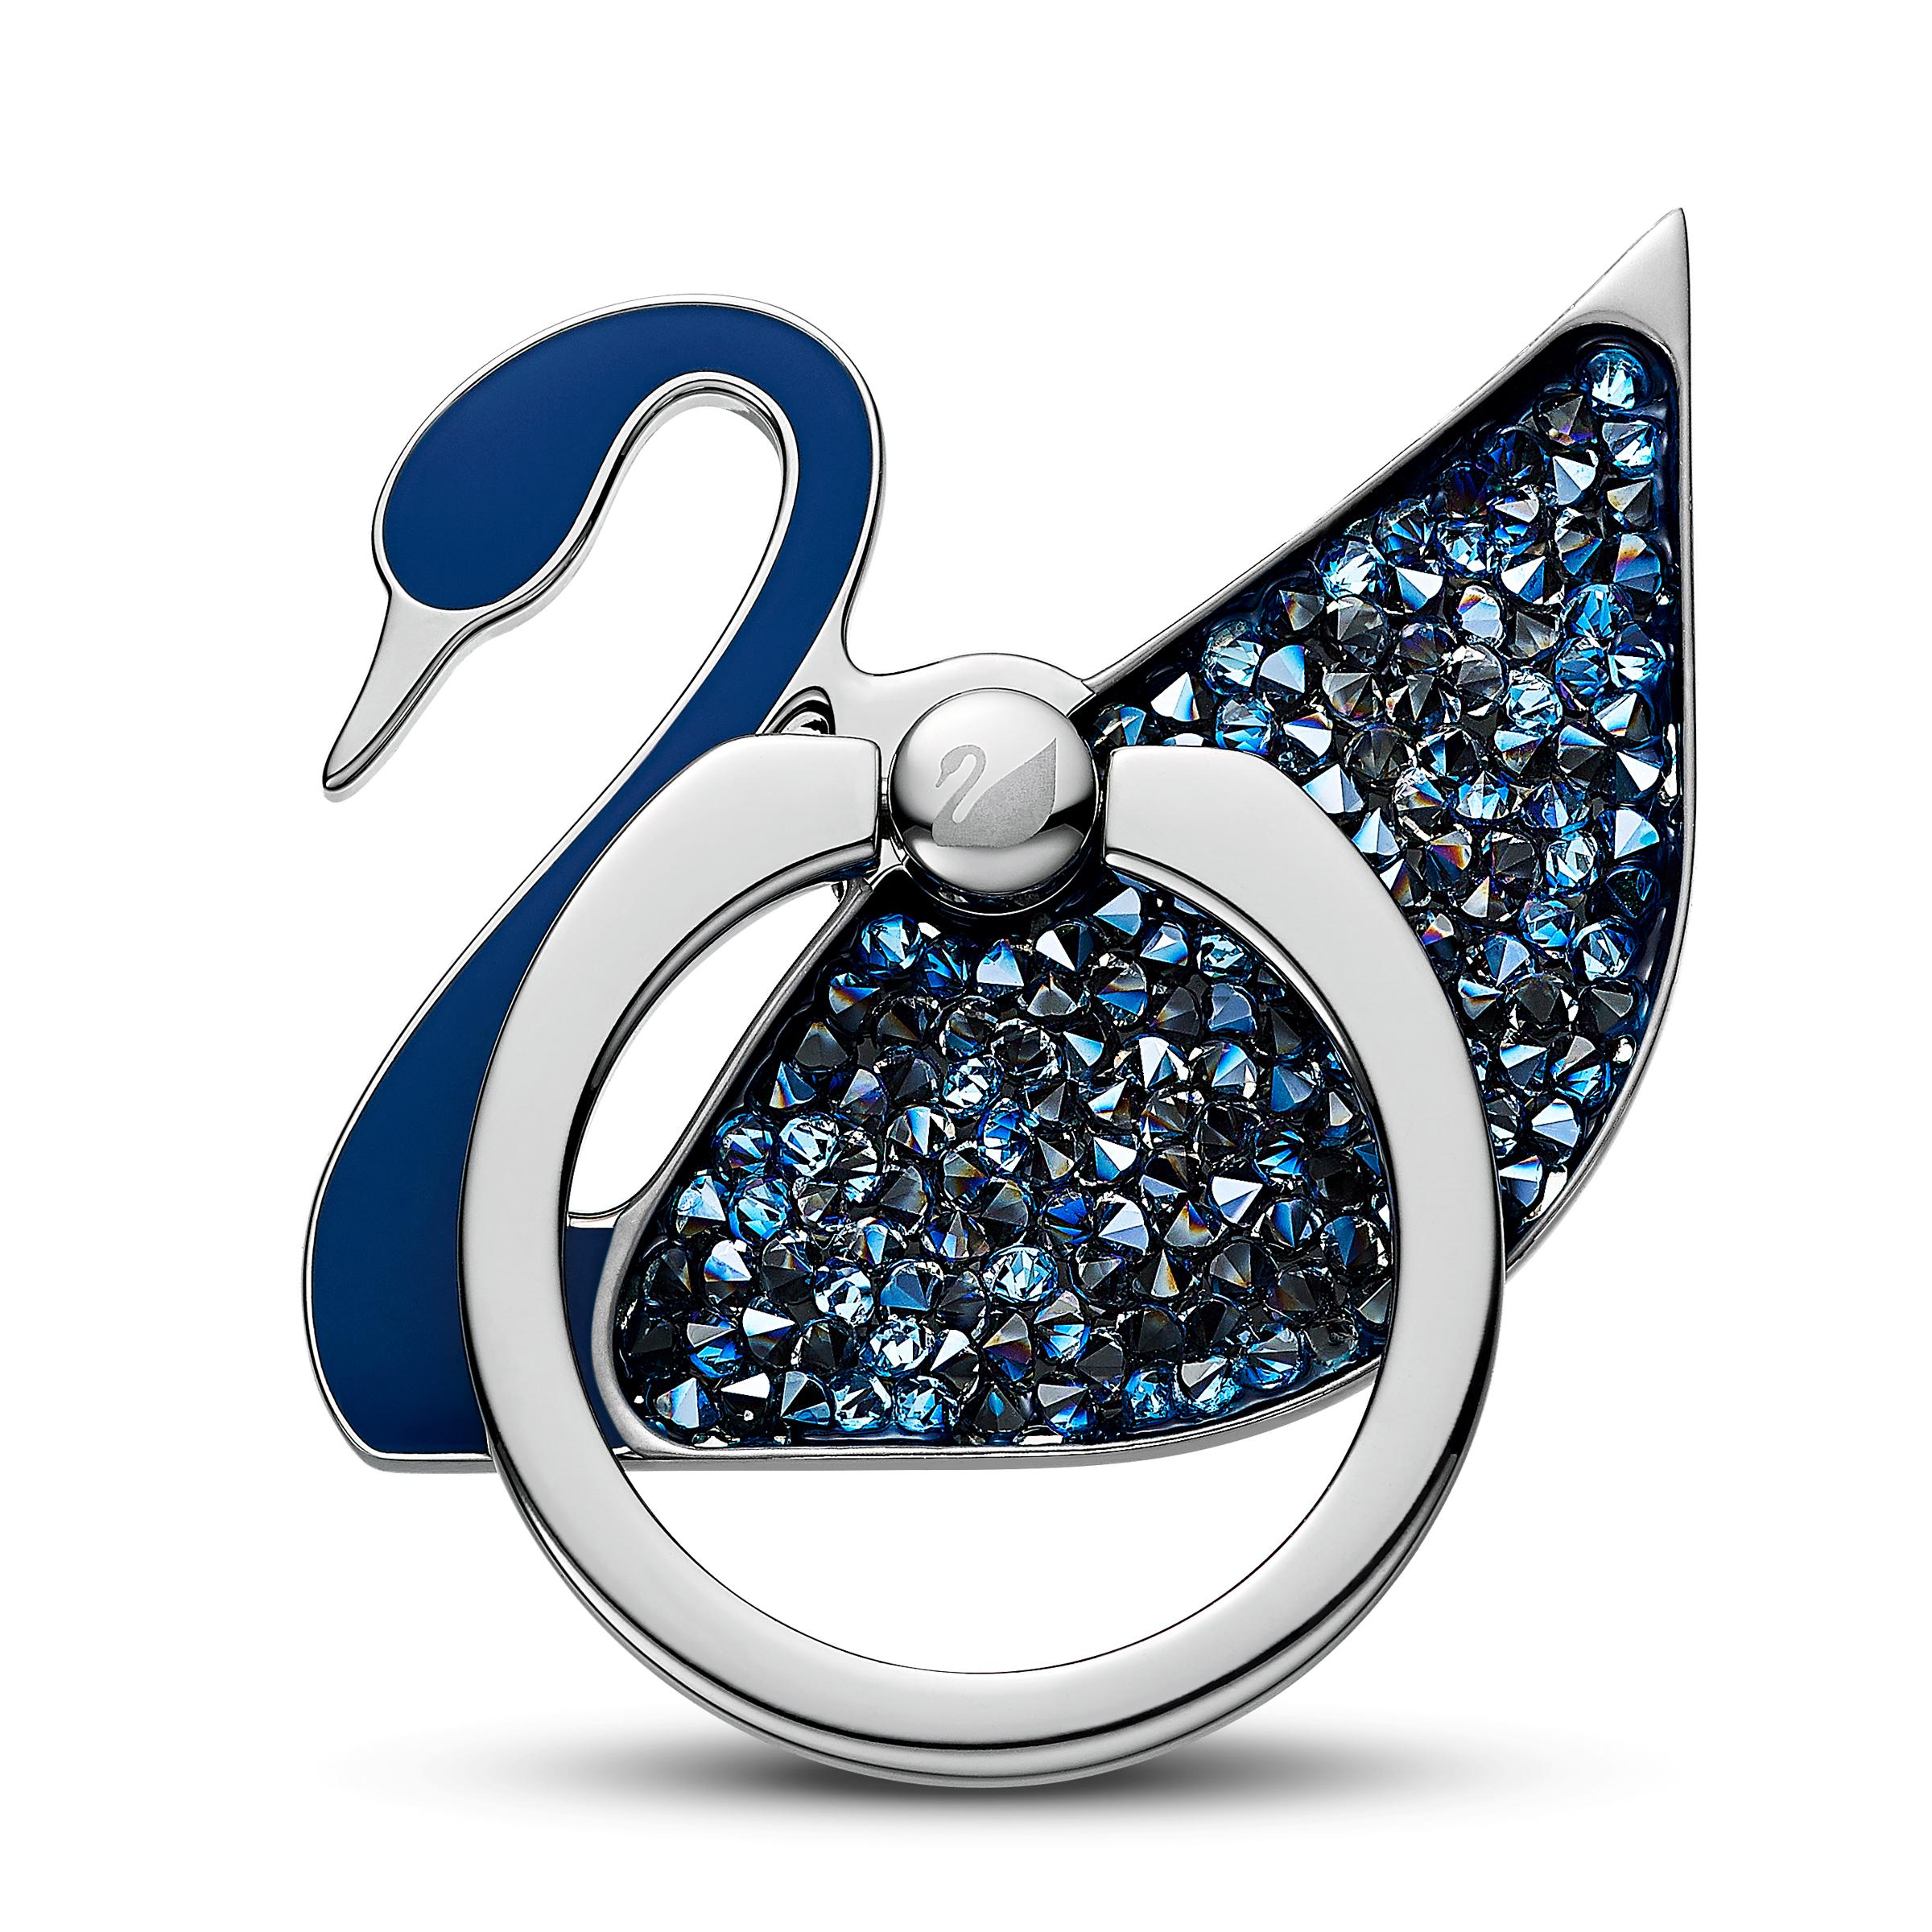 Anneau autocollant Swan, bleu, acier inoxydable, Swarovski